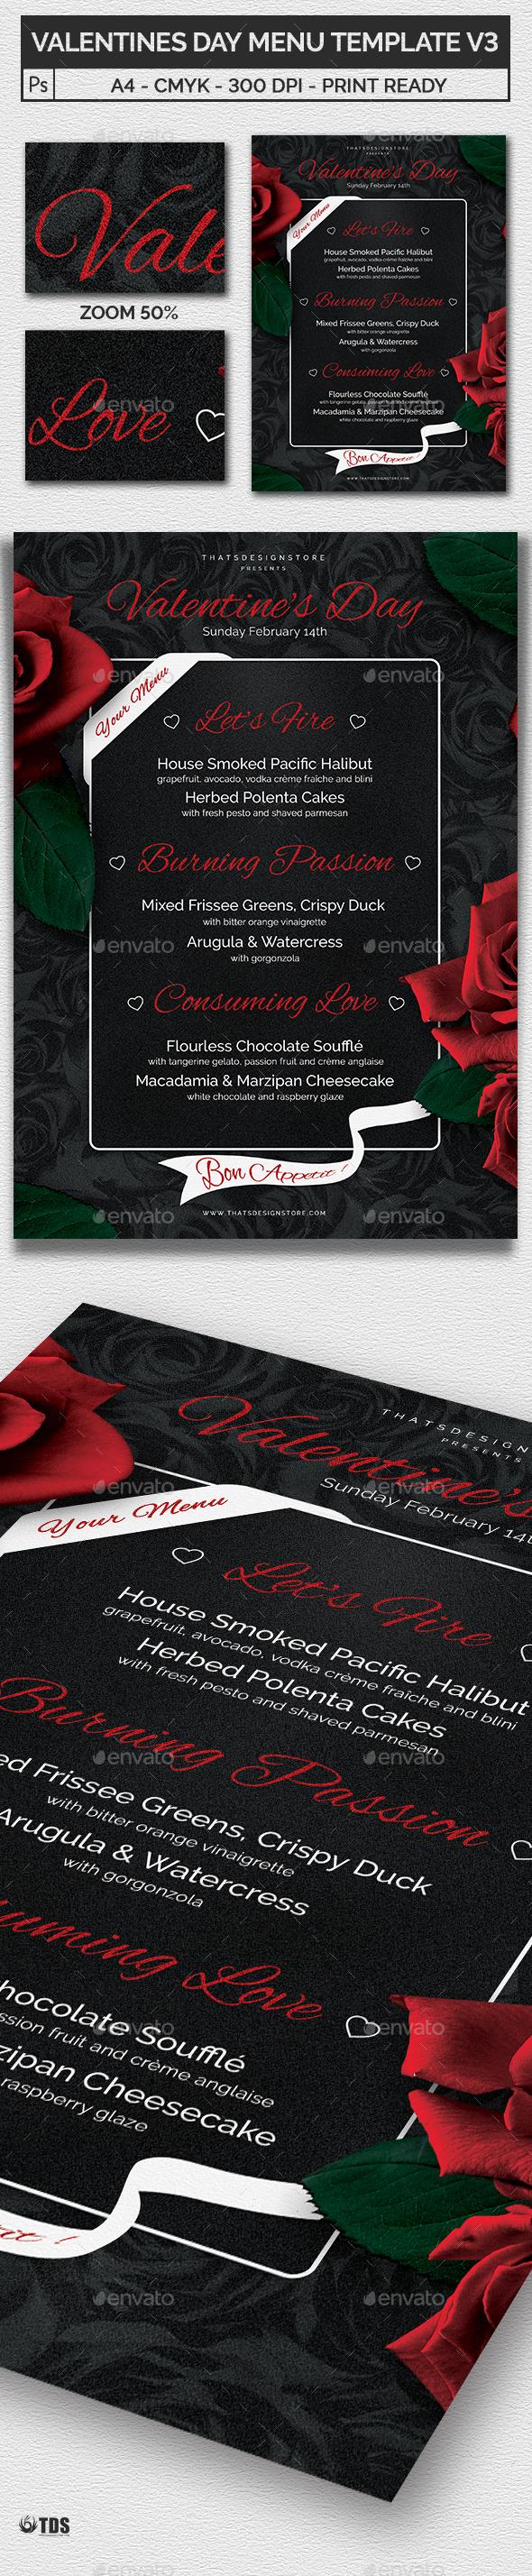 Valentines Day Menu Template V3 - Restaurant Flyers